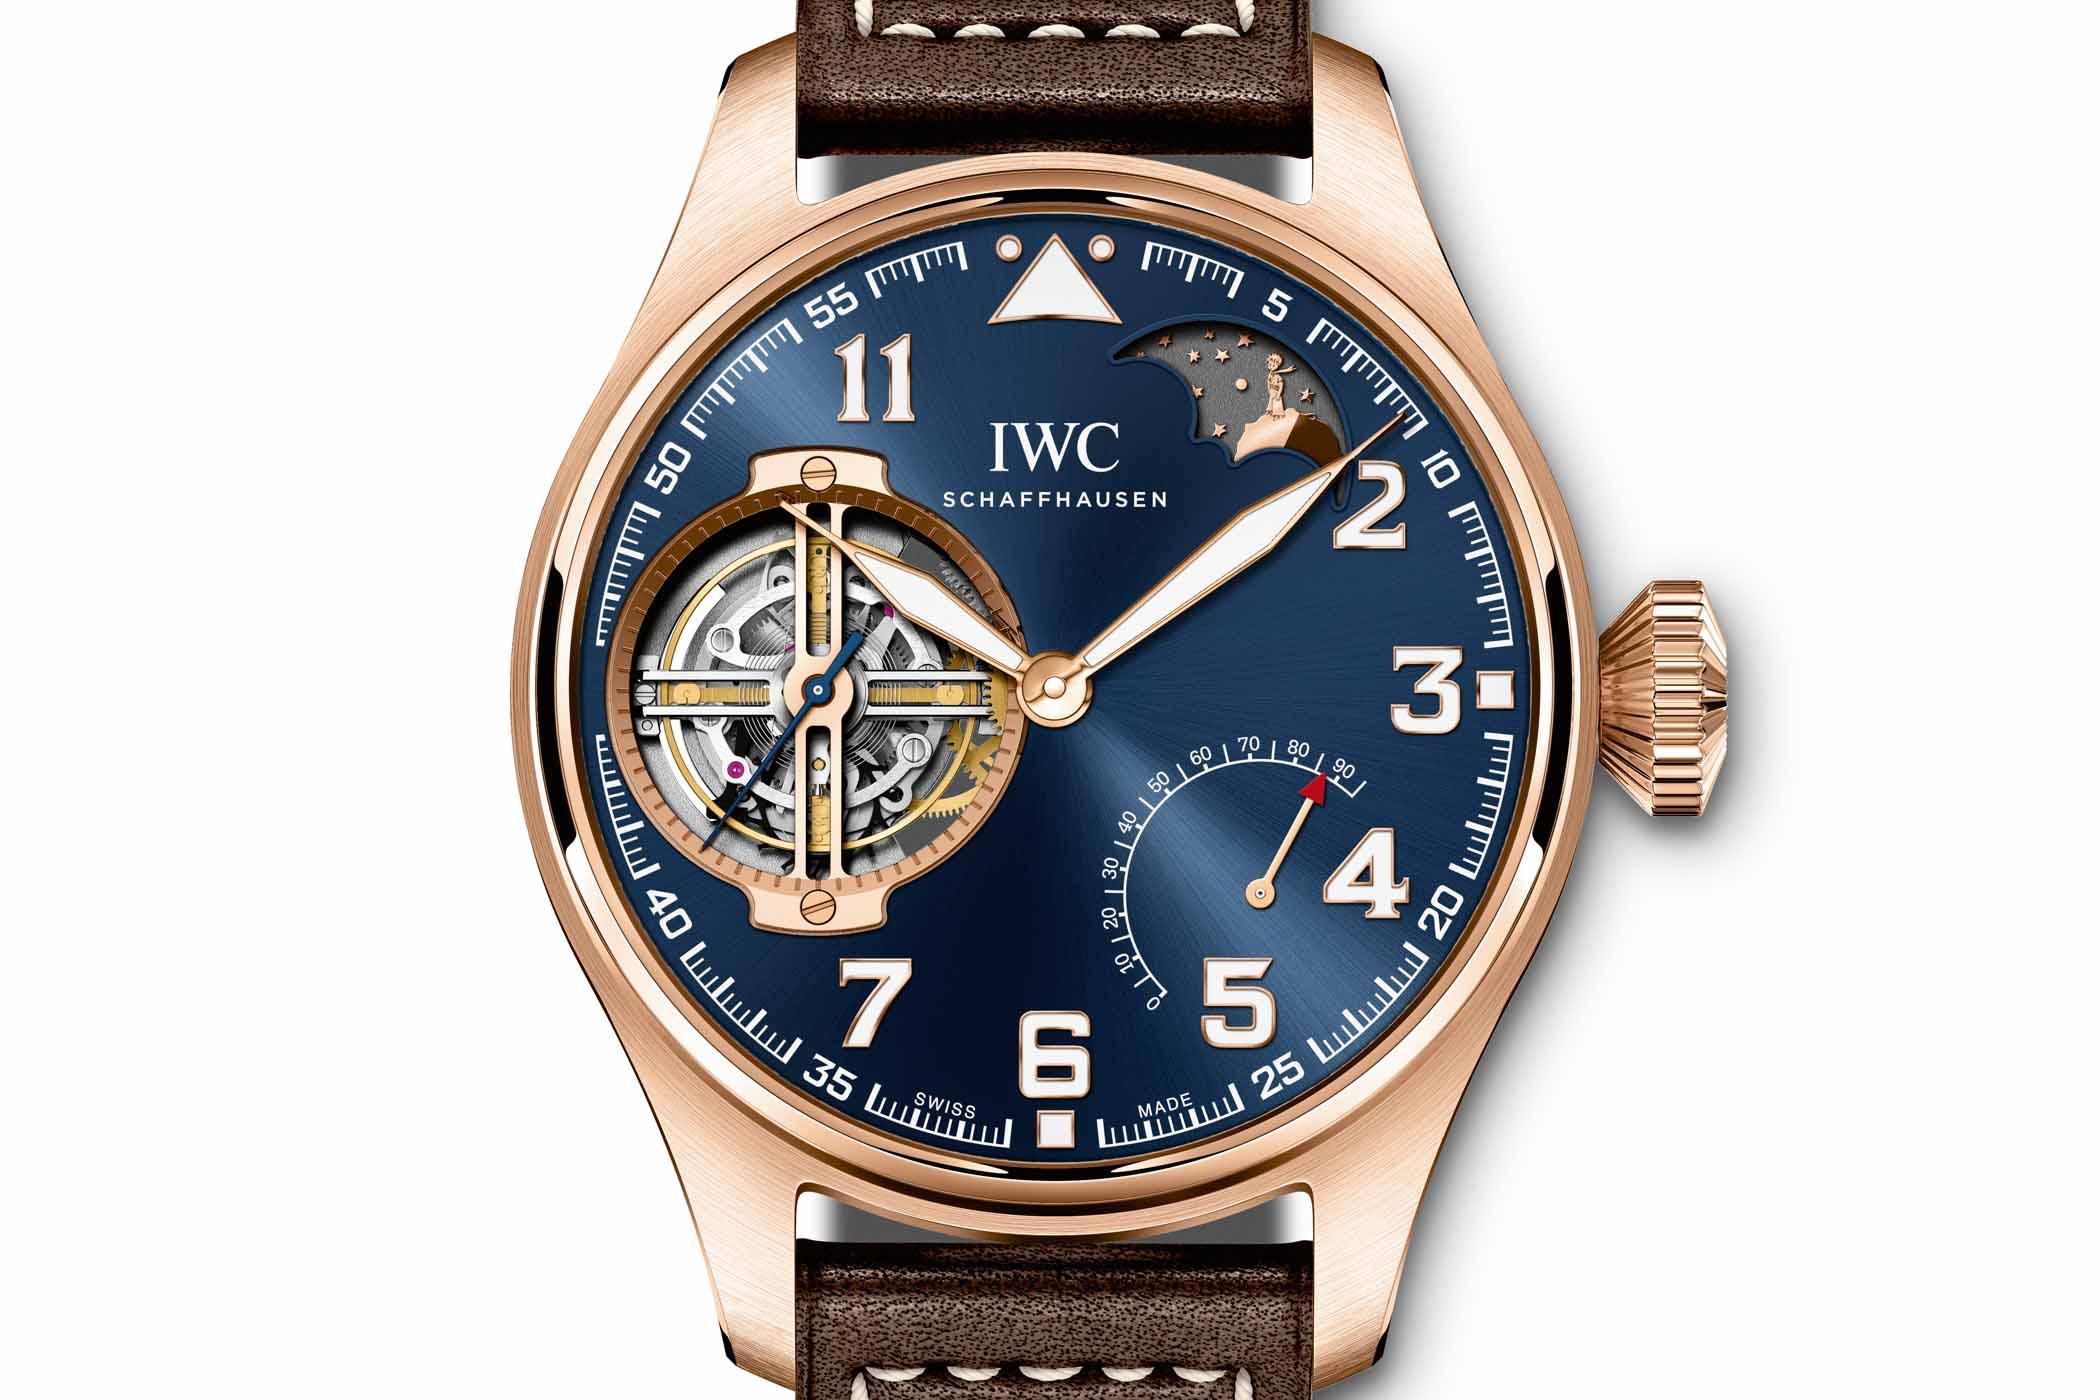 iwc-big-pilots-watch-constant-force-tourbillon-edition-le-petit-prince-iw590303-sihh-2019-3.jpg